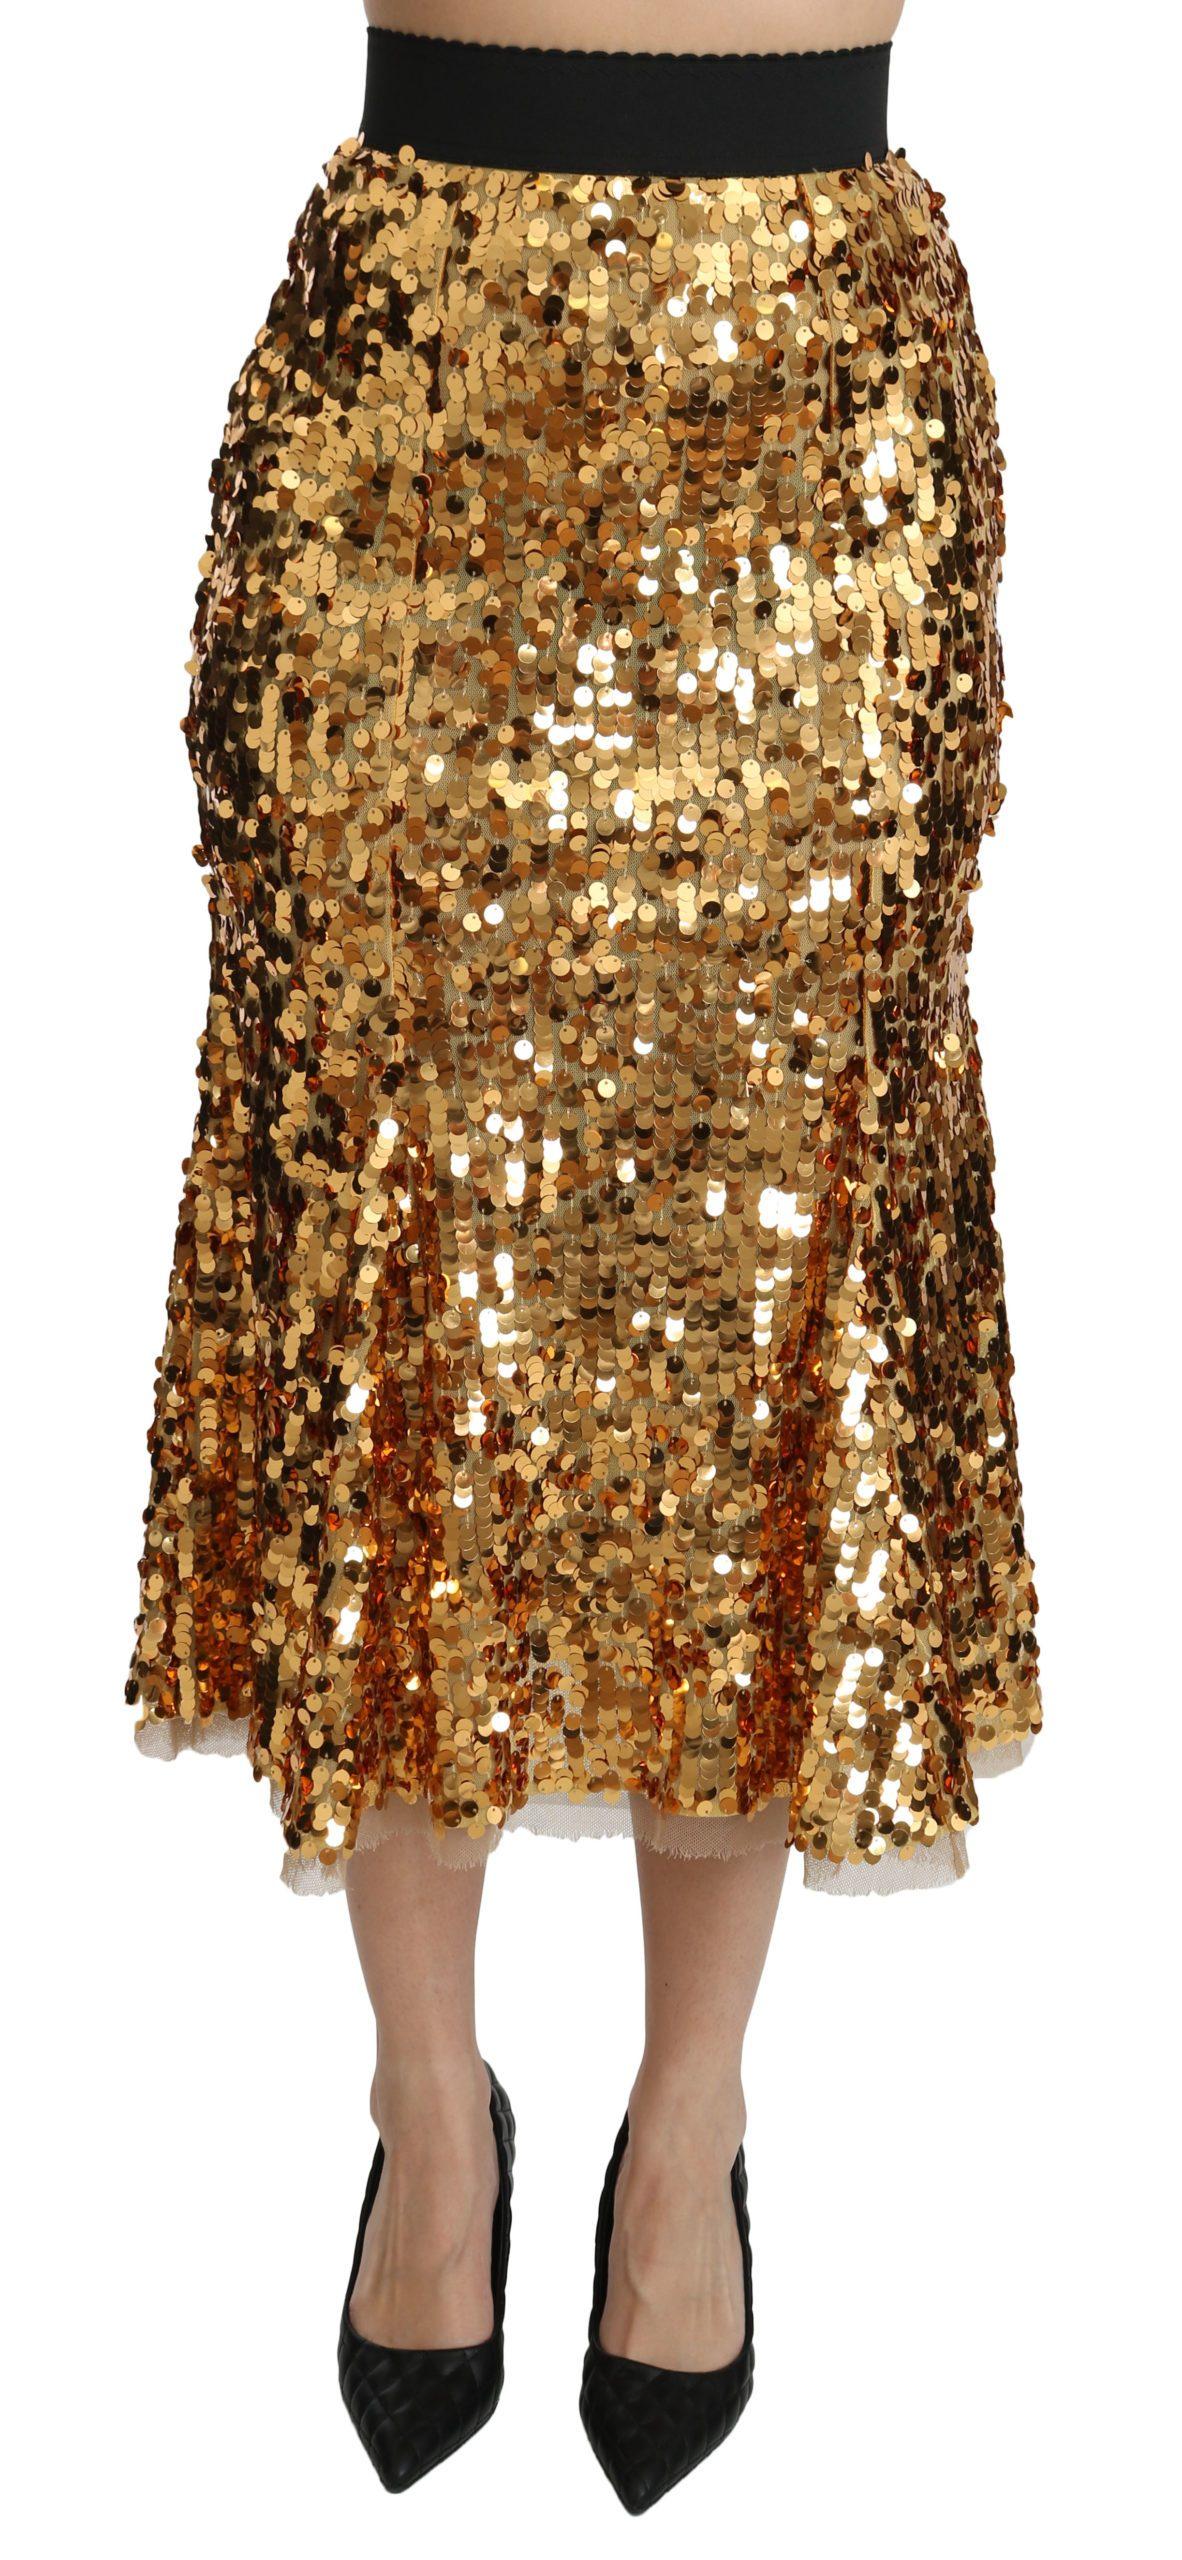 Dolce & Gabbana Women's Sequined Shiny High Waist Midi Skirt Gold SKI1370 - IT40|S